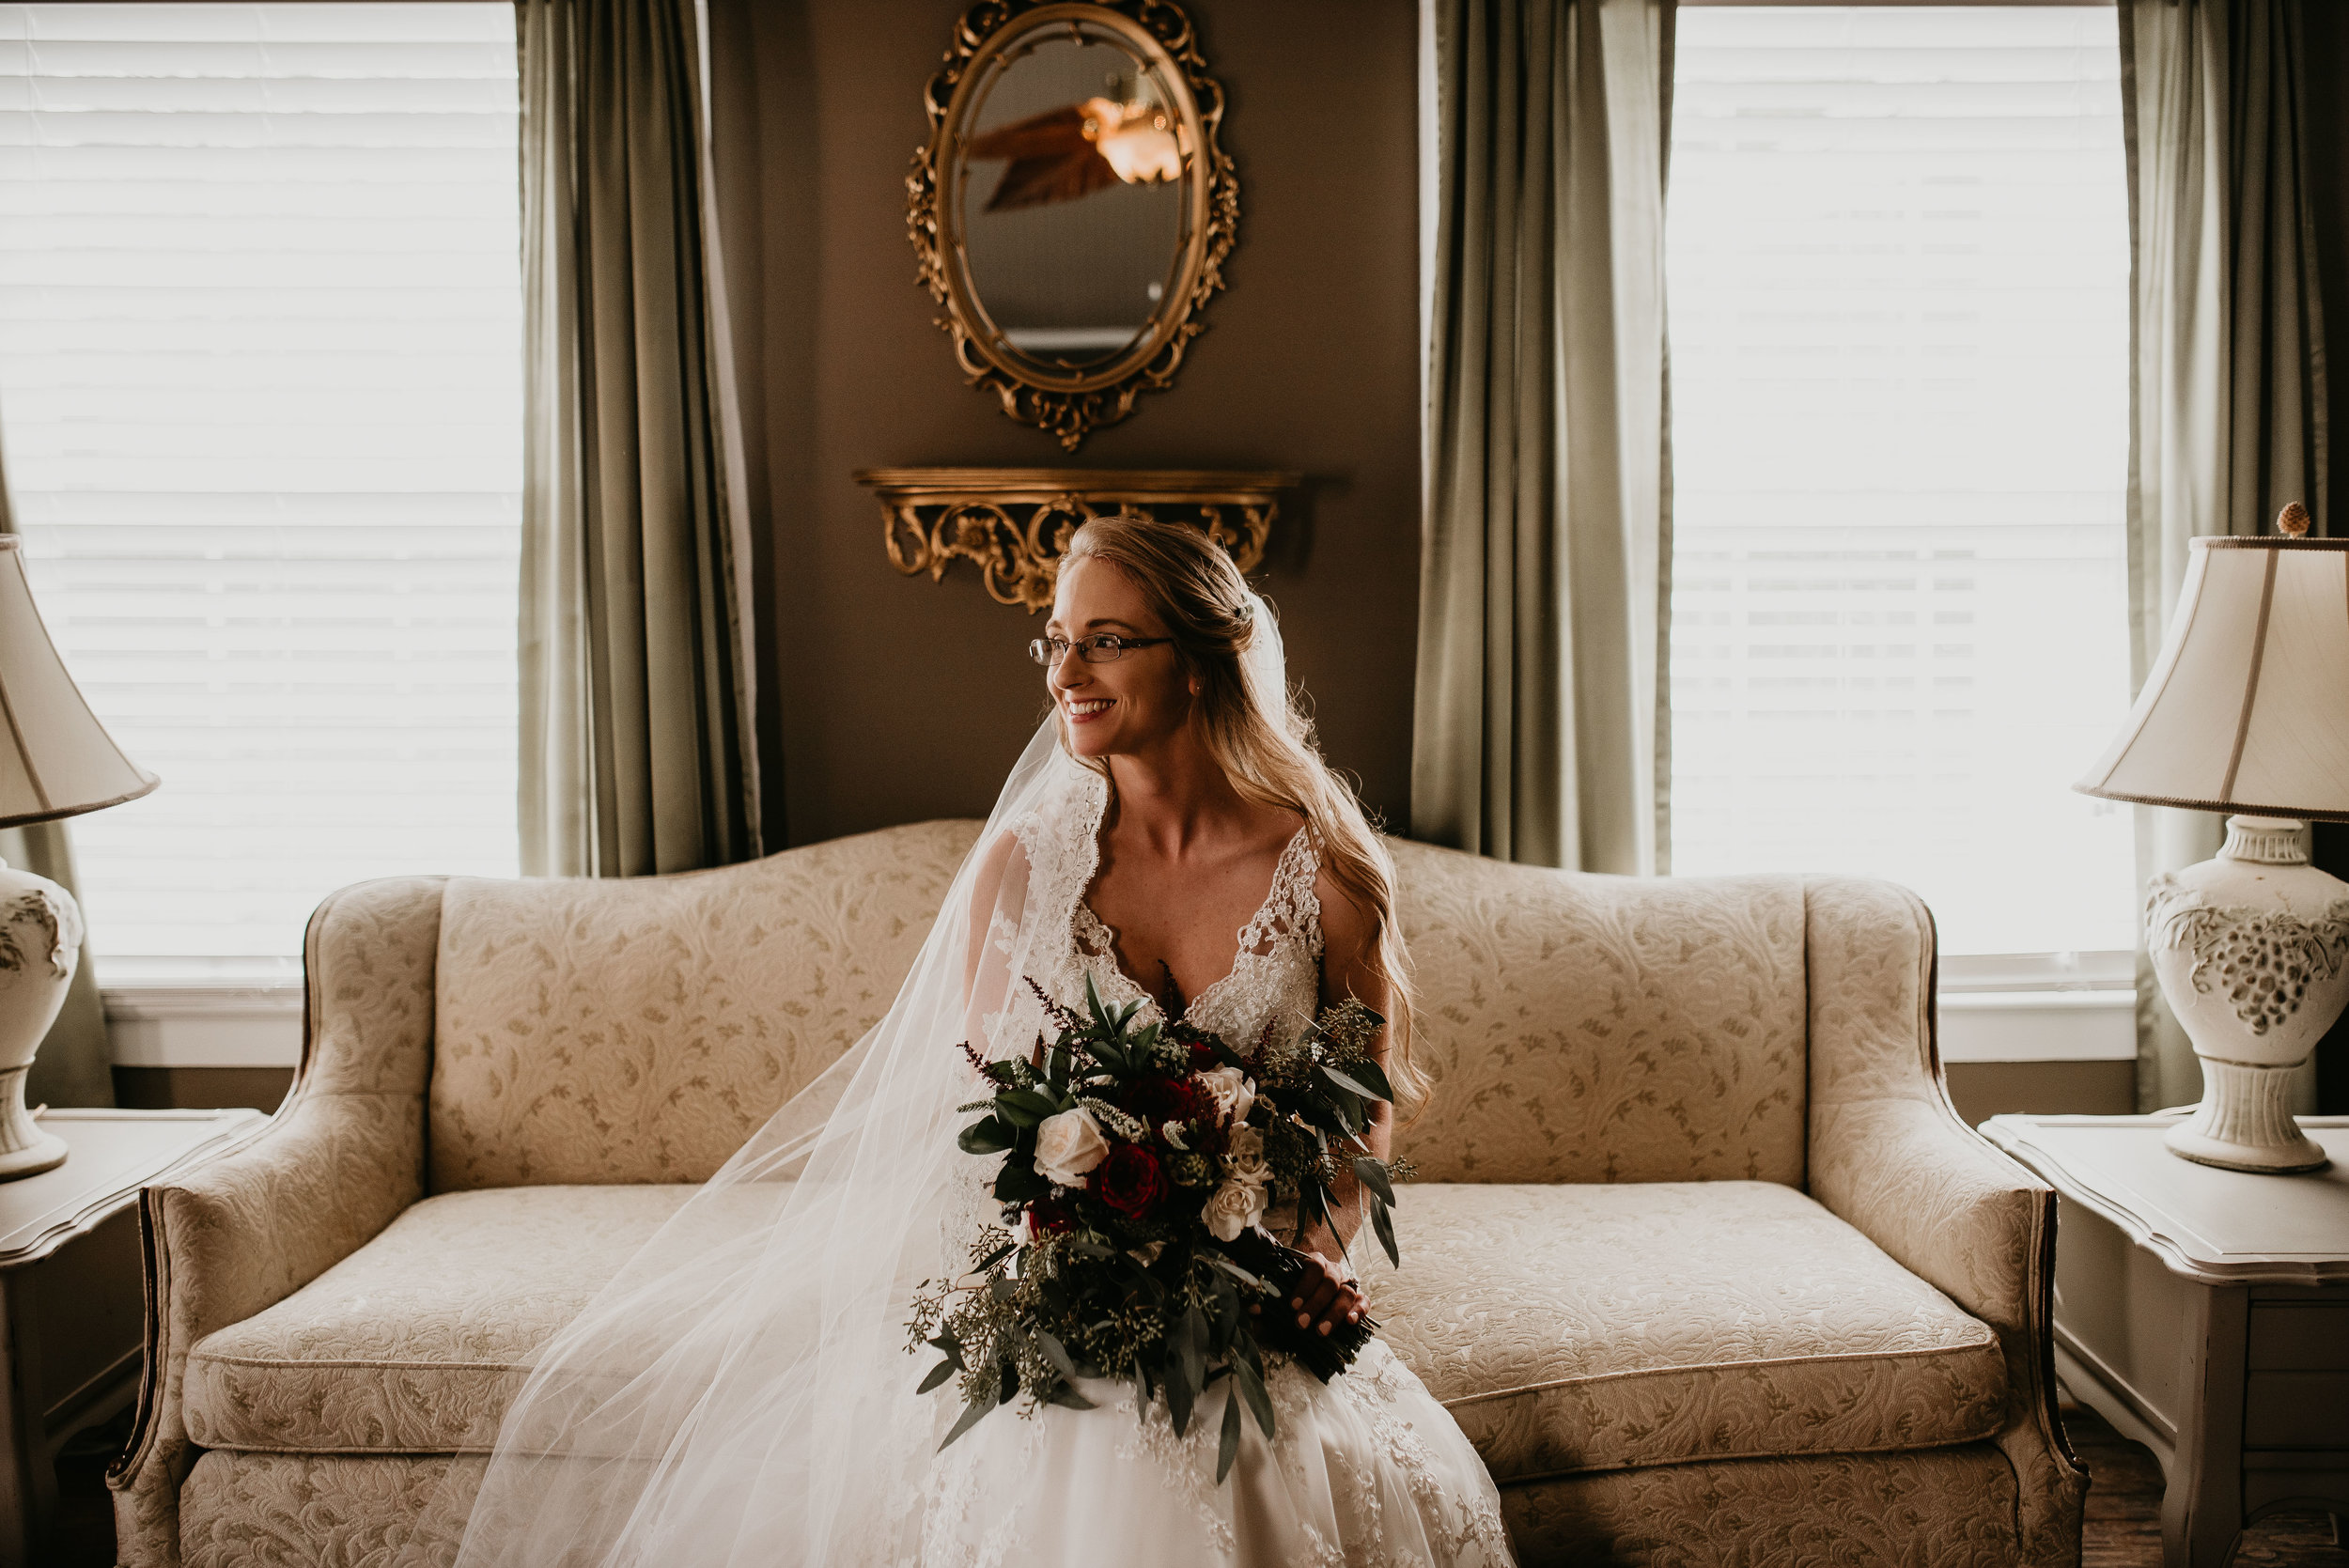 Bride smiling before ceremony at Inn at Oak Lawn Farms, in Carrollton, GA